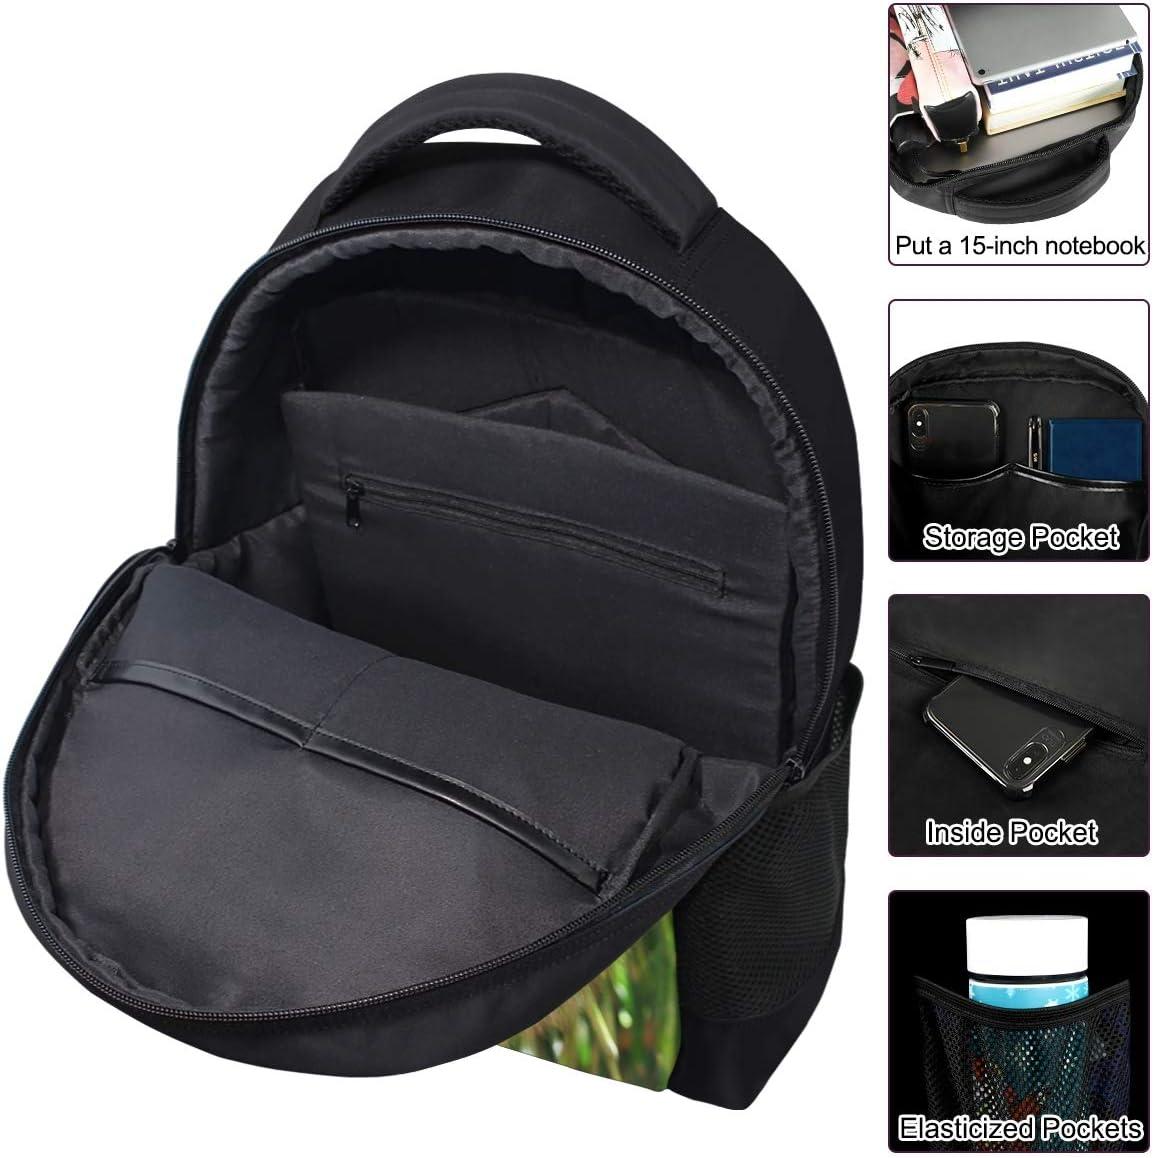 ALAZA Koala Casual Backpack Waterproof Travel Daypack School Bag